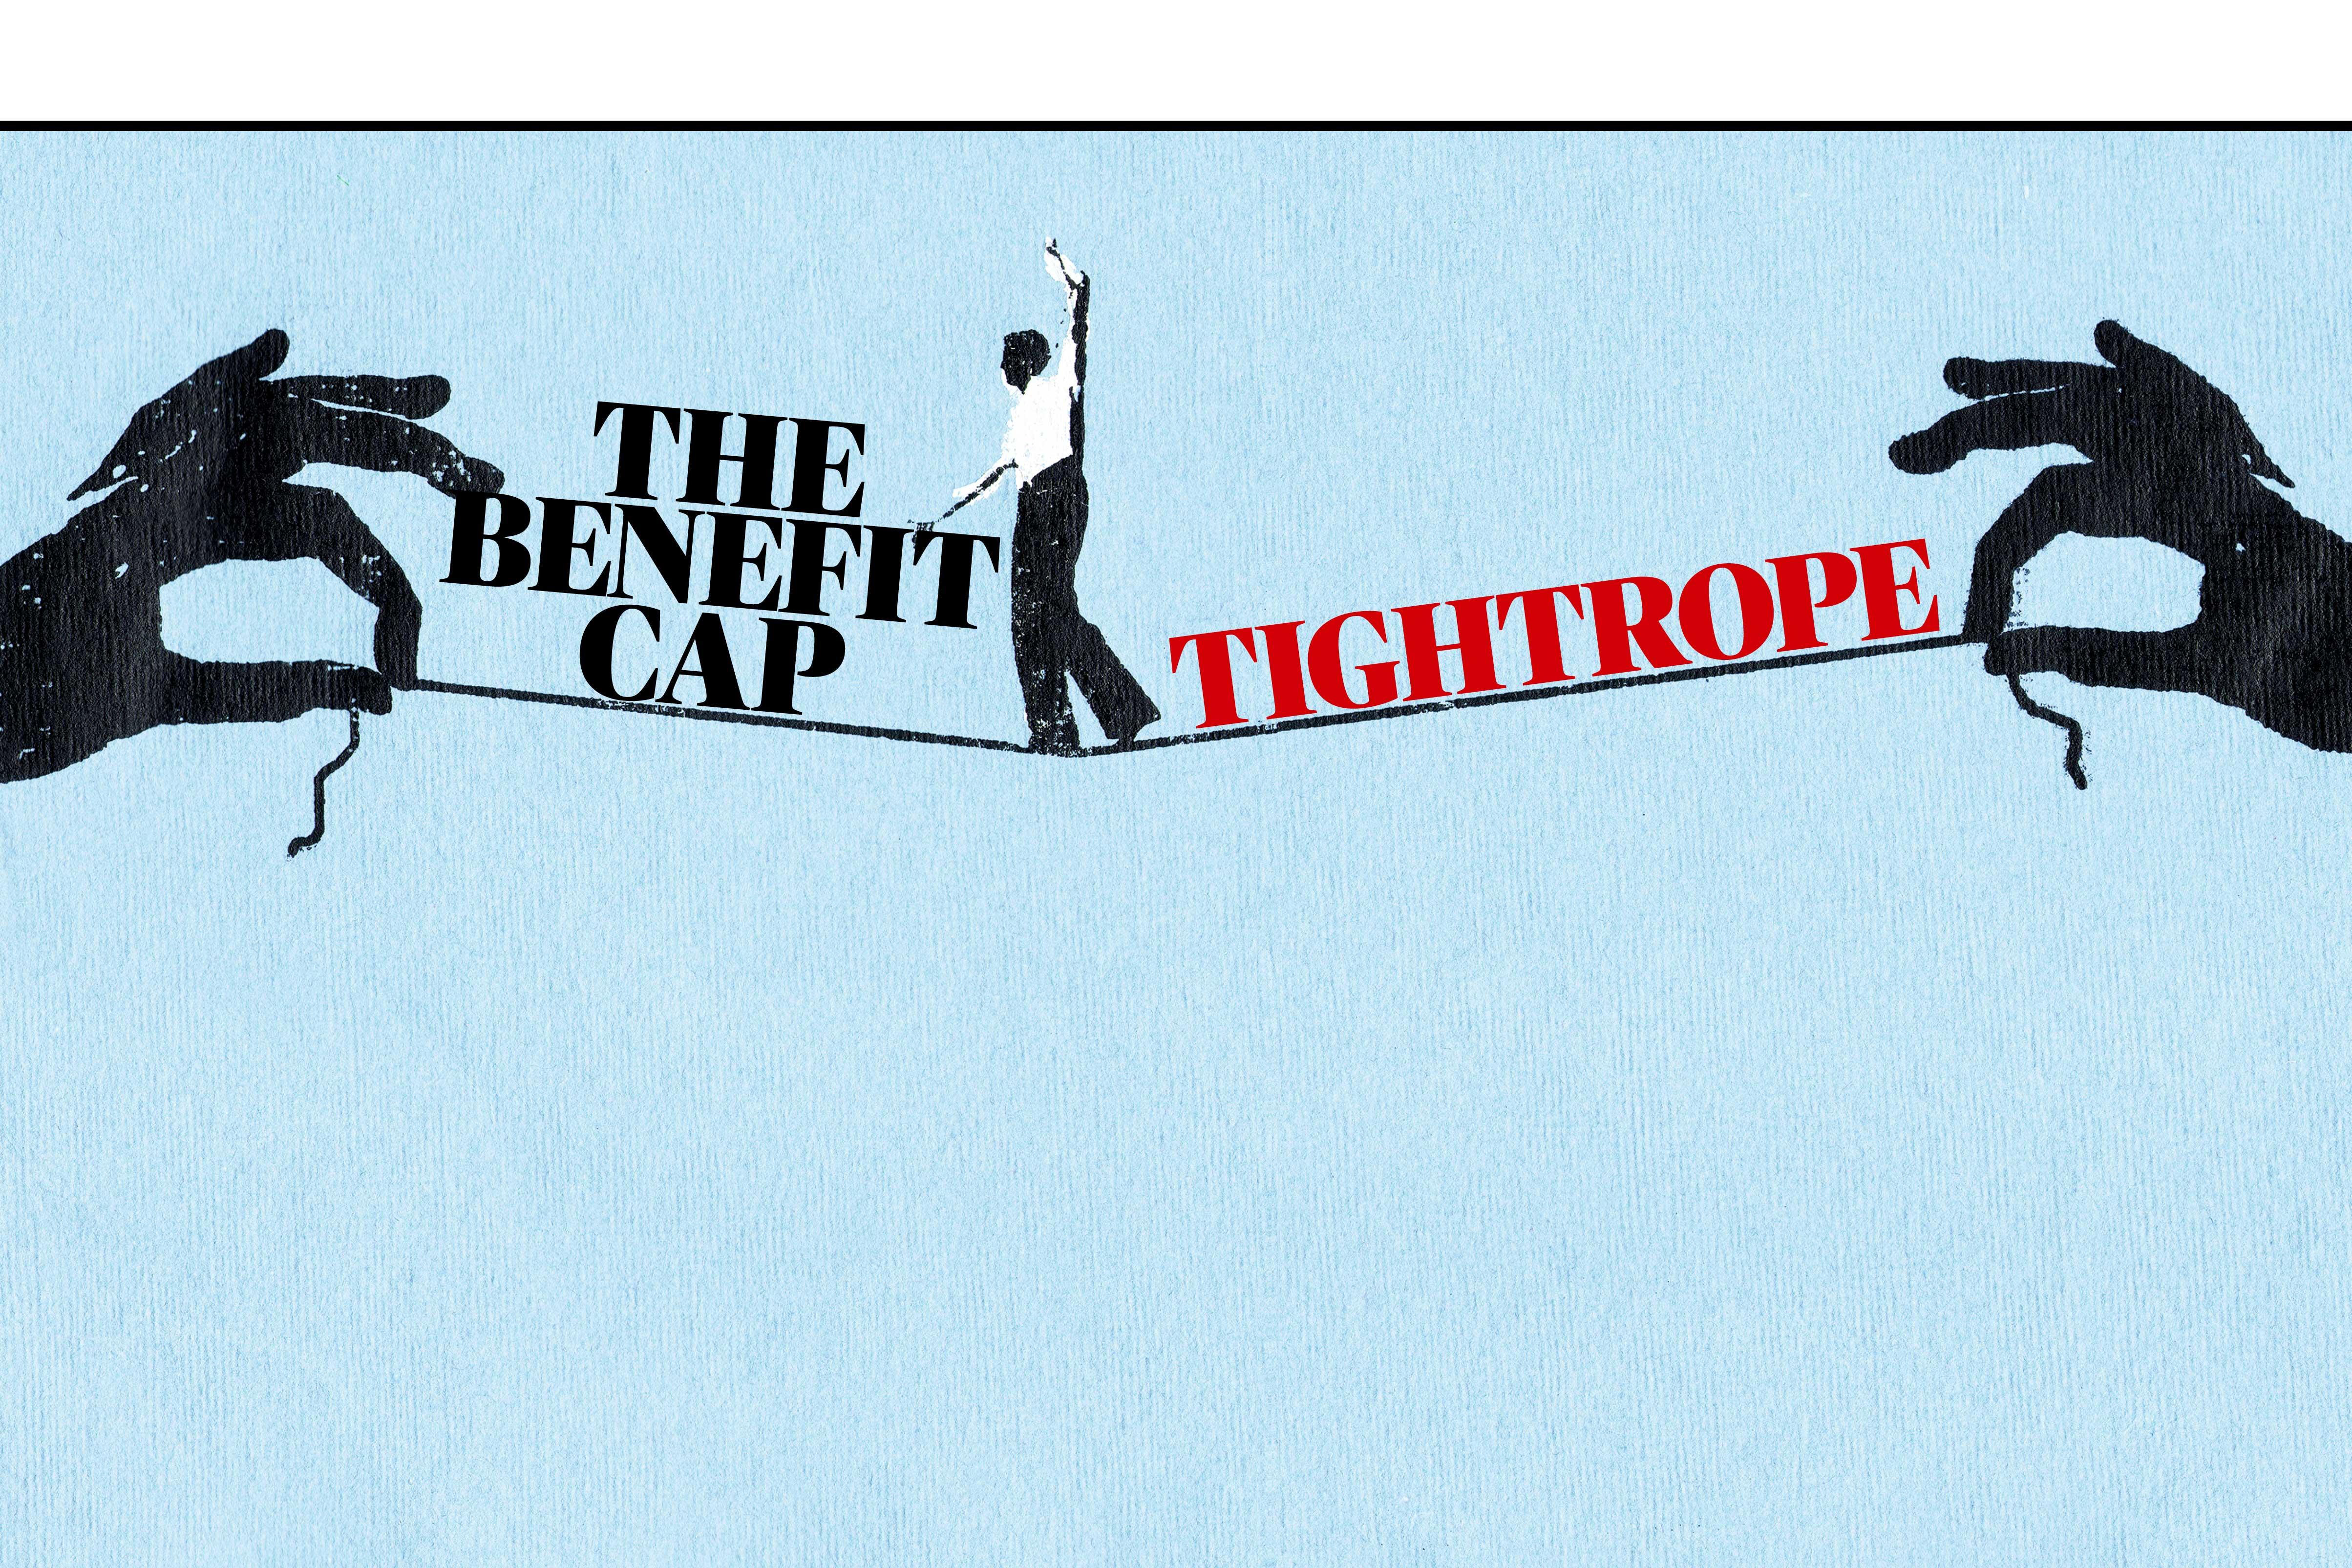 Benefit cap - Wikipedia